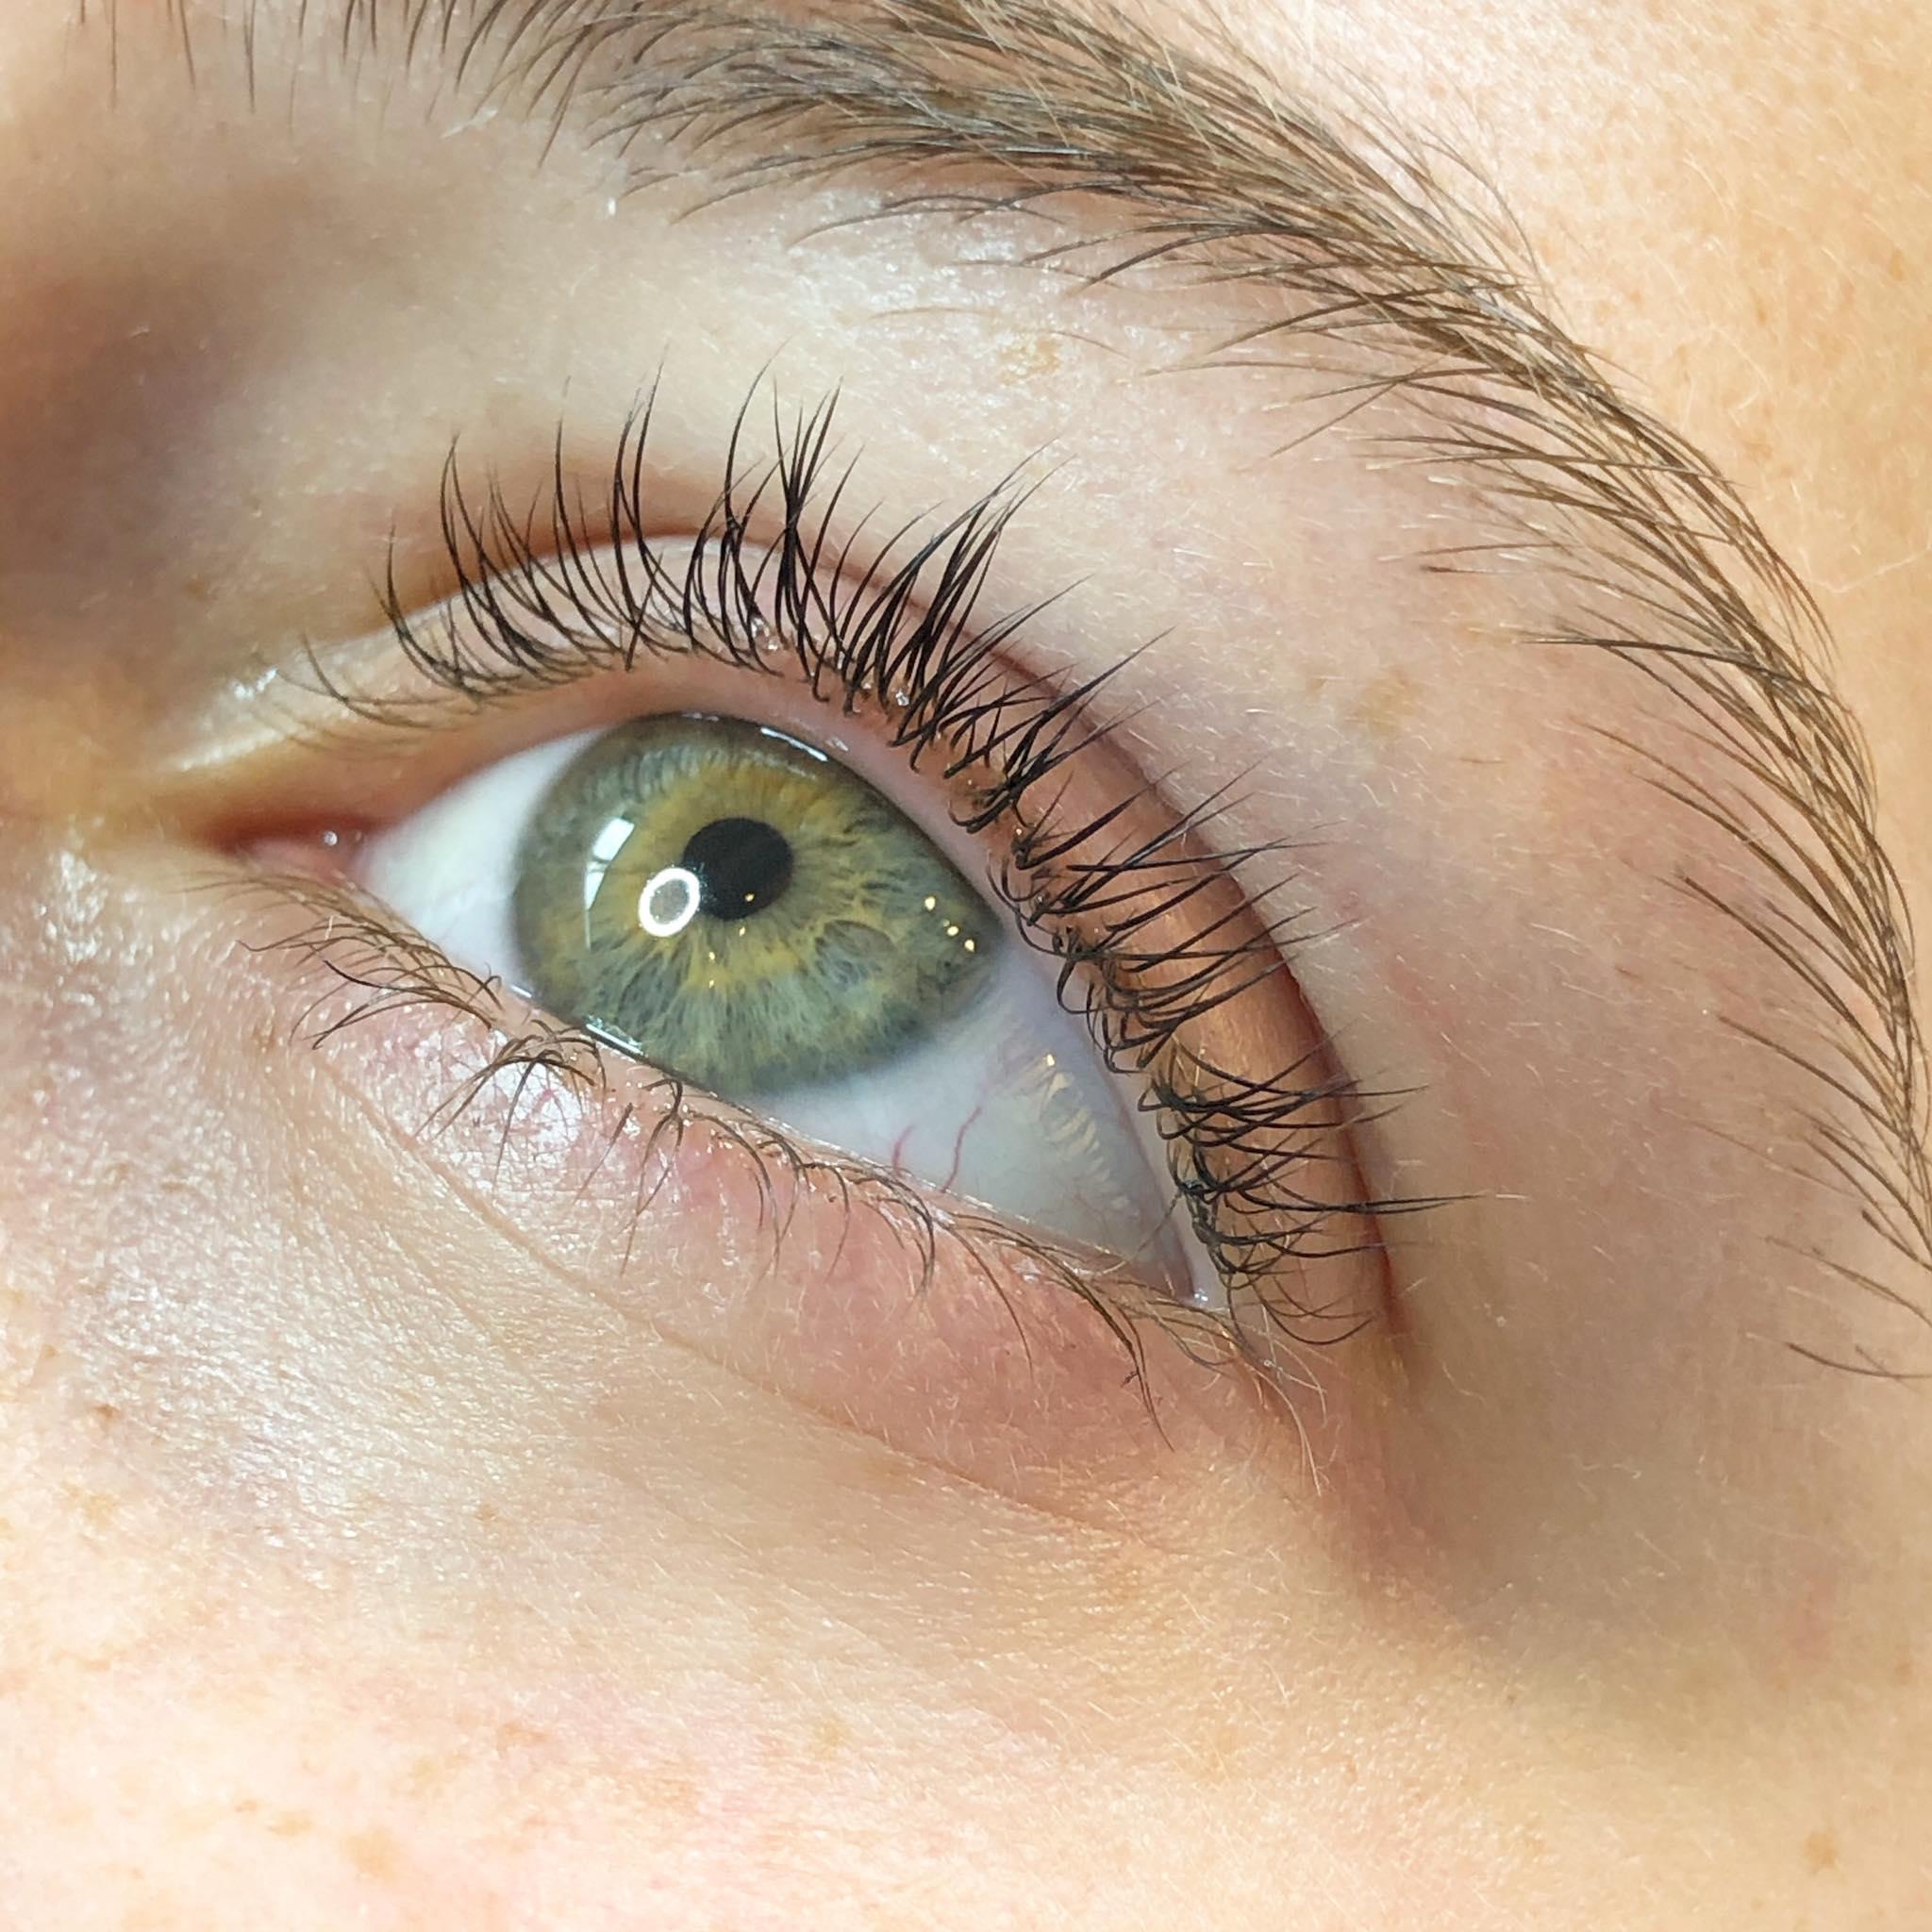 lashlift wimperlift schoonheidsinsituut bloom brows and beauty brugge